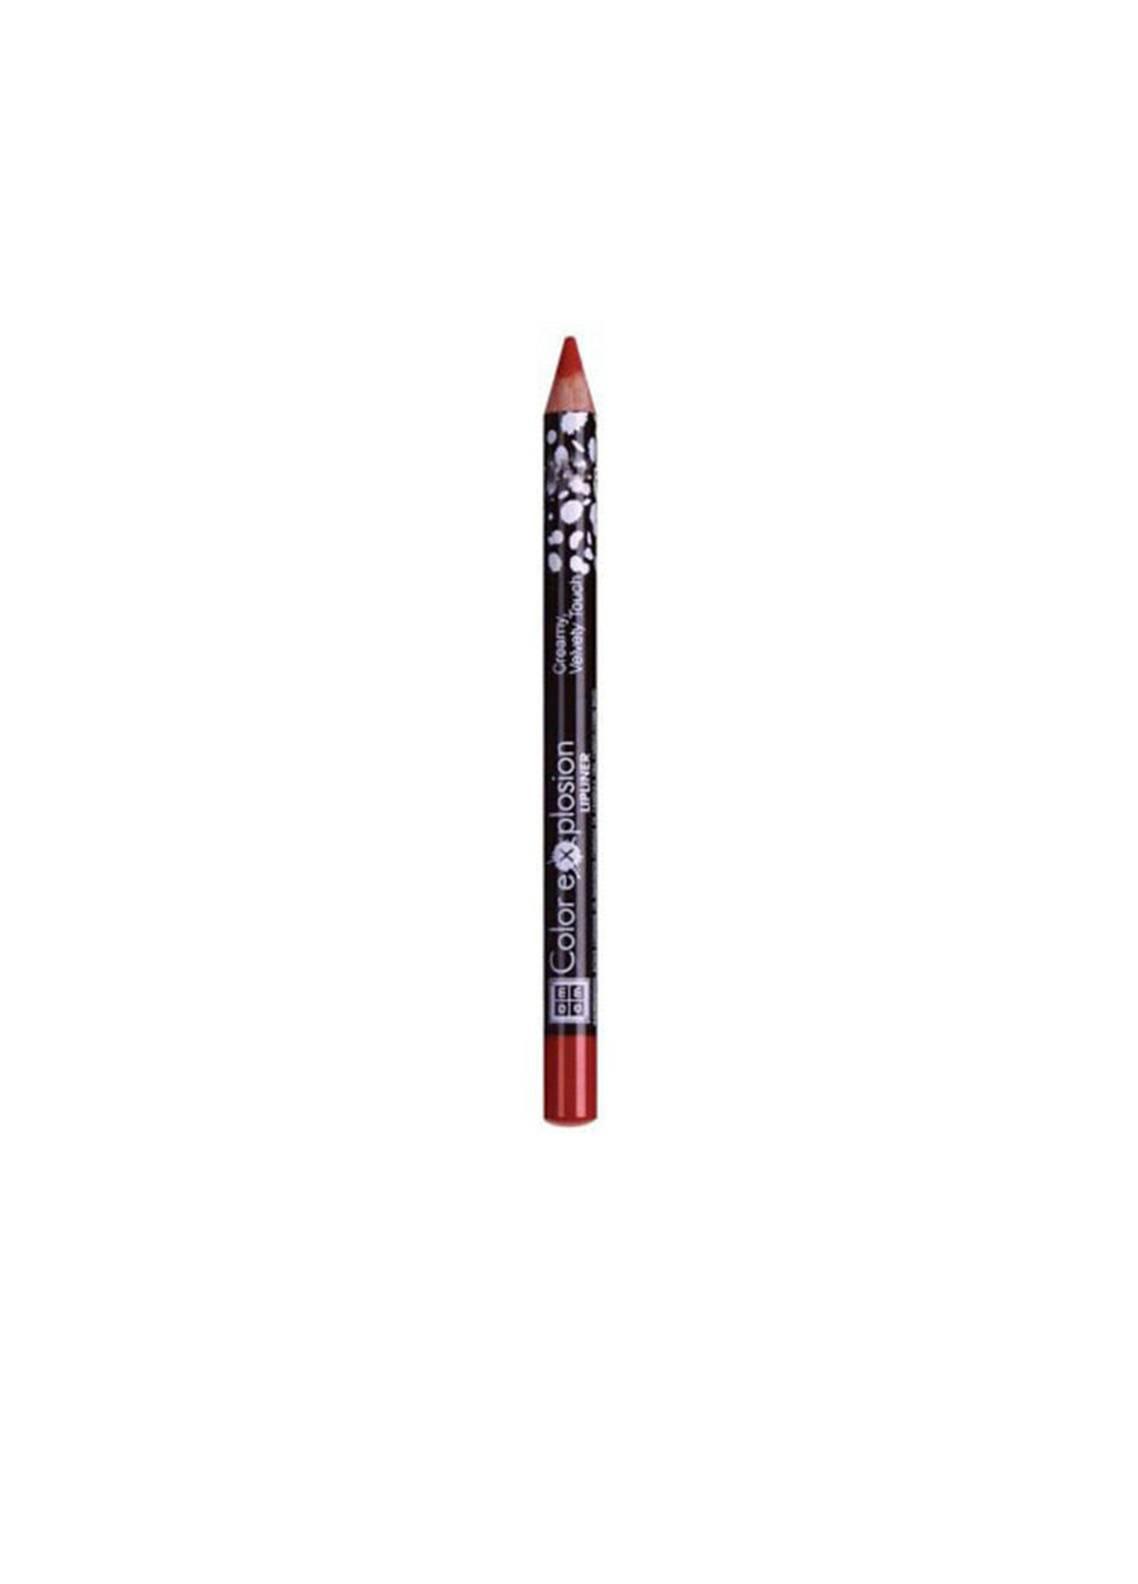 DMGM Color Explosion Lipliner - Delicious Praline - 19